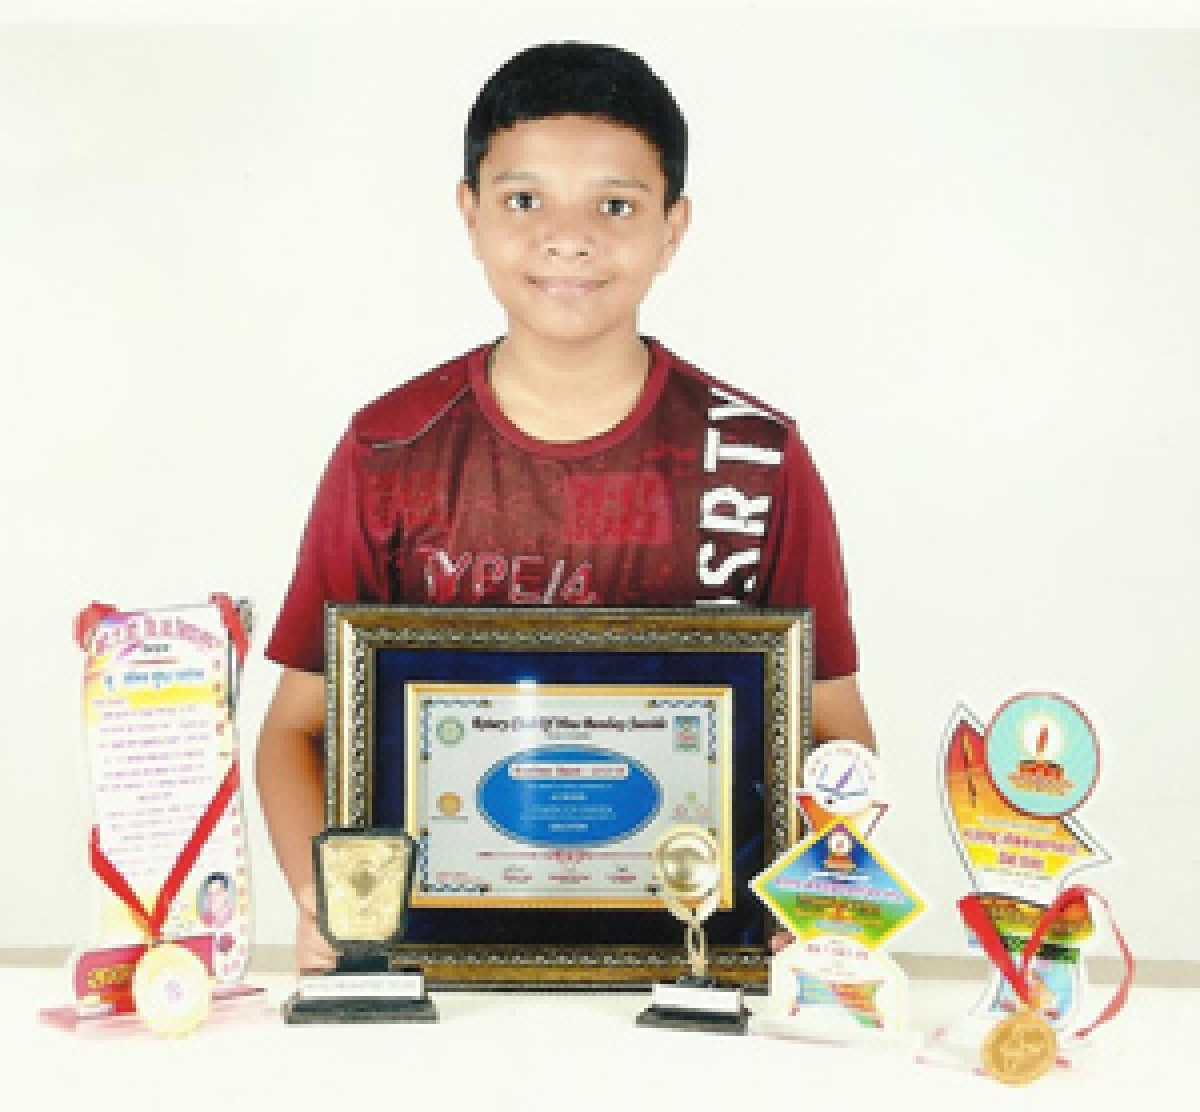 'Dim-witted' boy wins 'Bal Vaigyanik' award